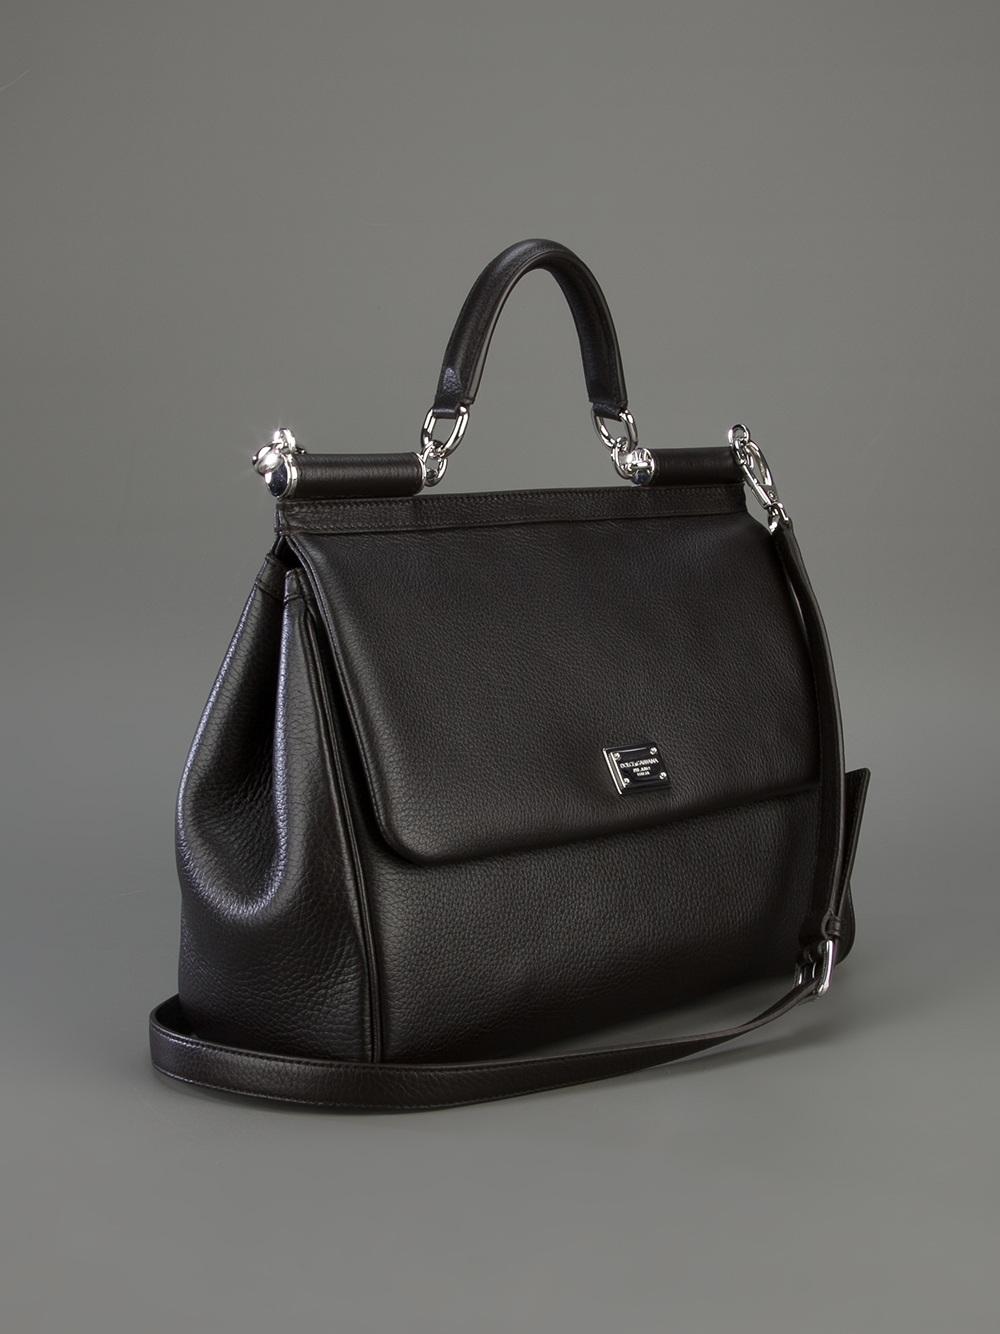 2c93dc94b2 Dolce   Gabbana Classic Leather Tote in Black - Lyst